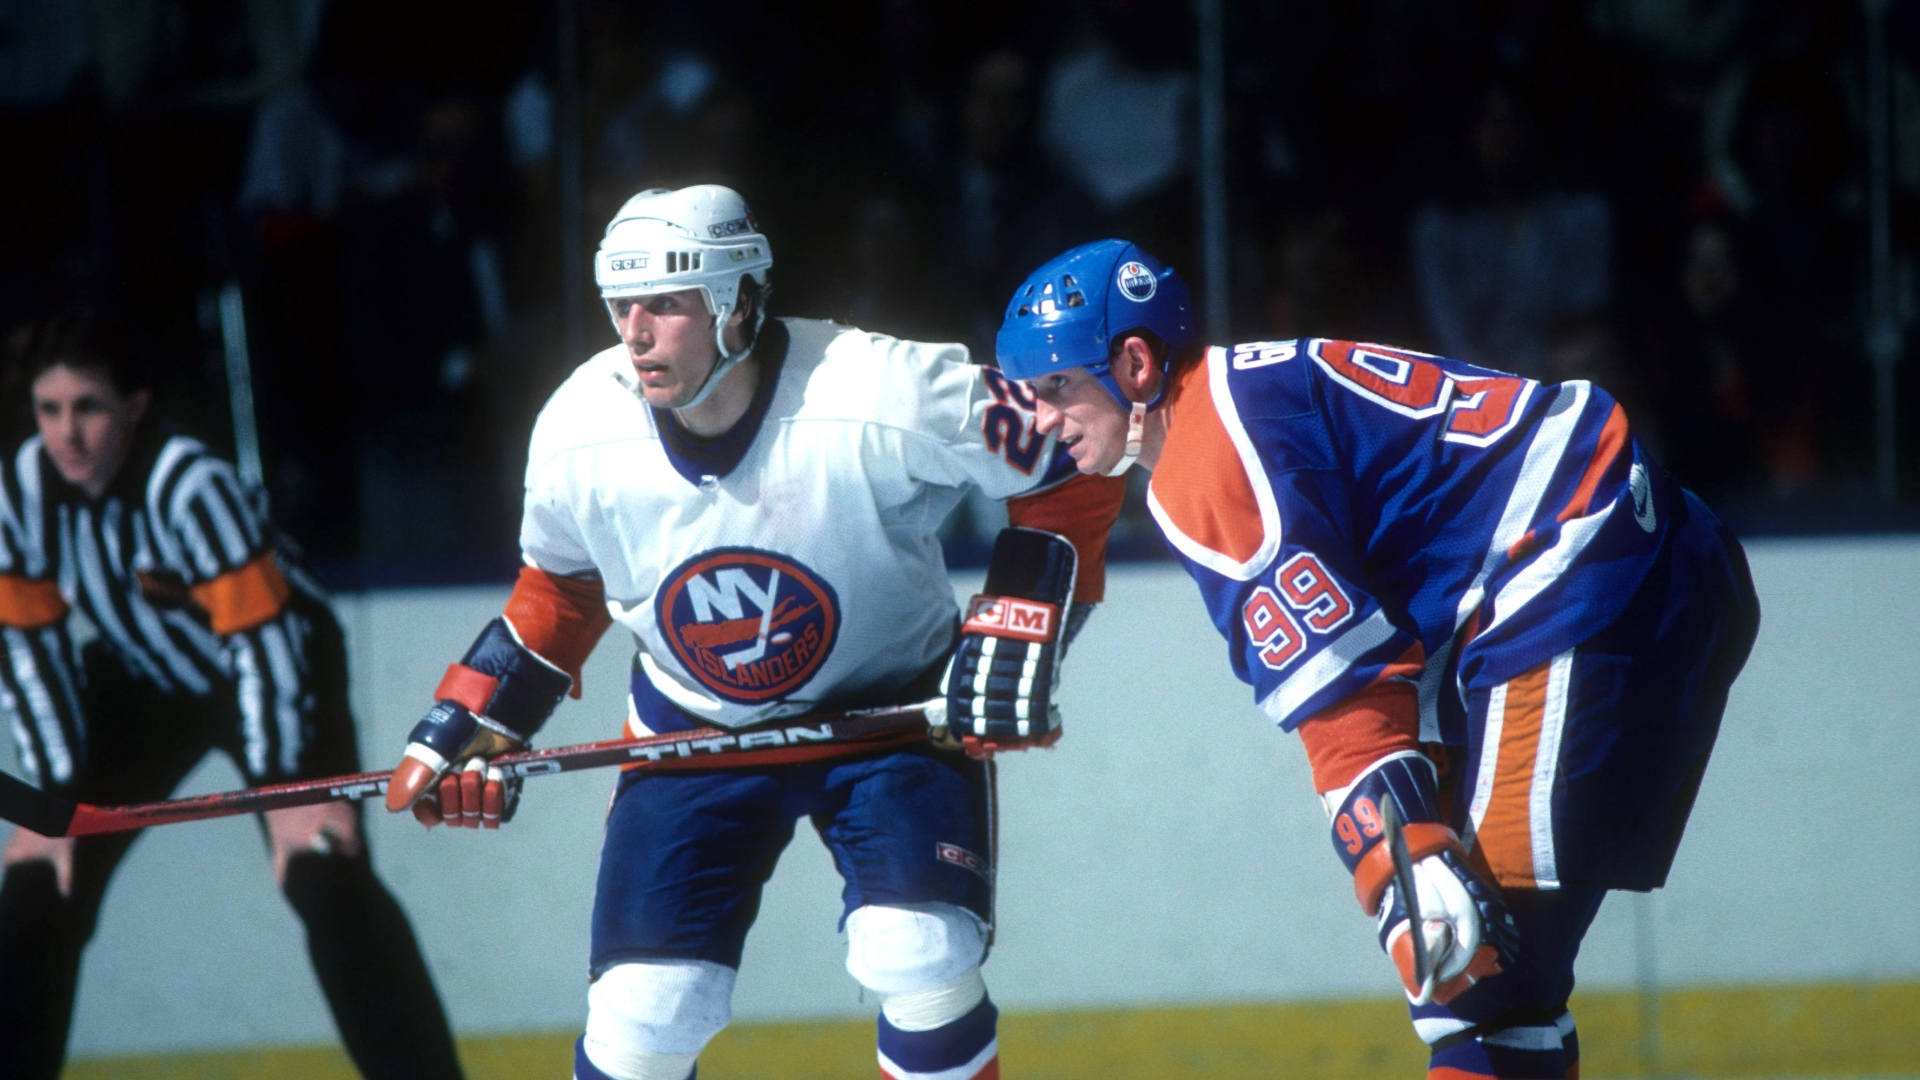 Mike Bossy et Wayne Gretzky